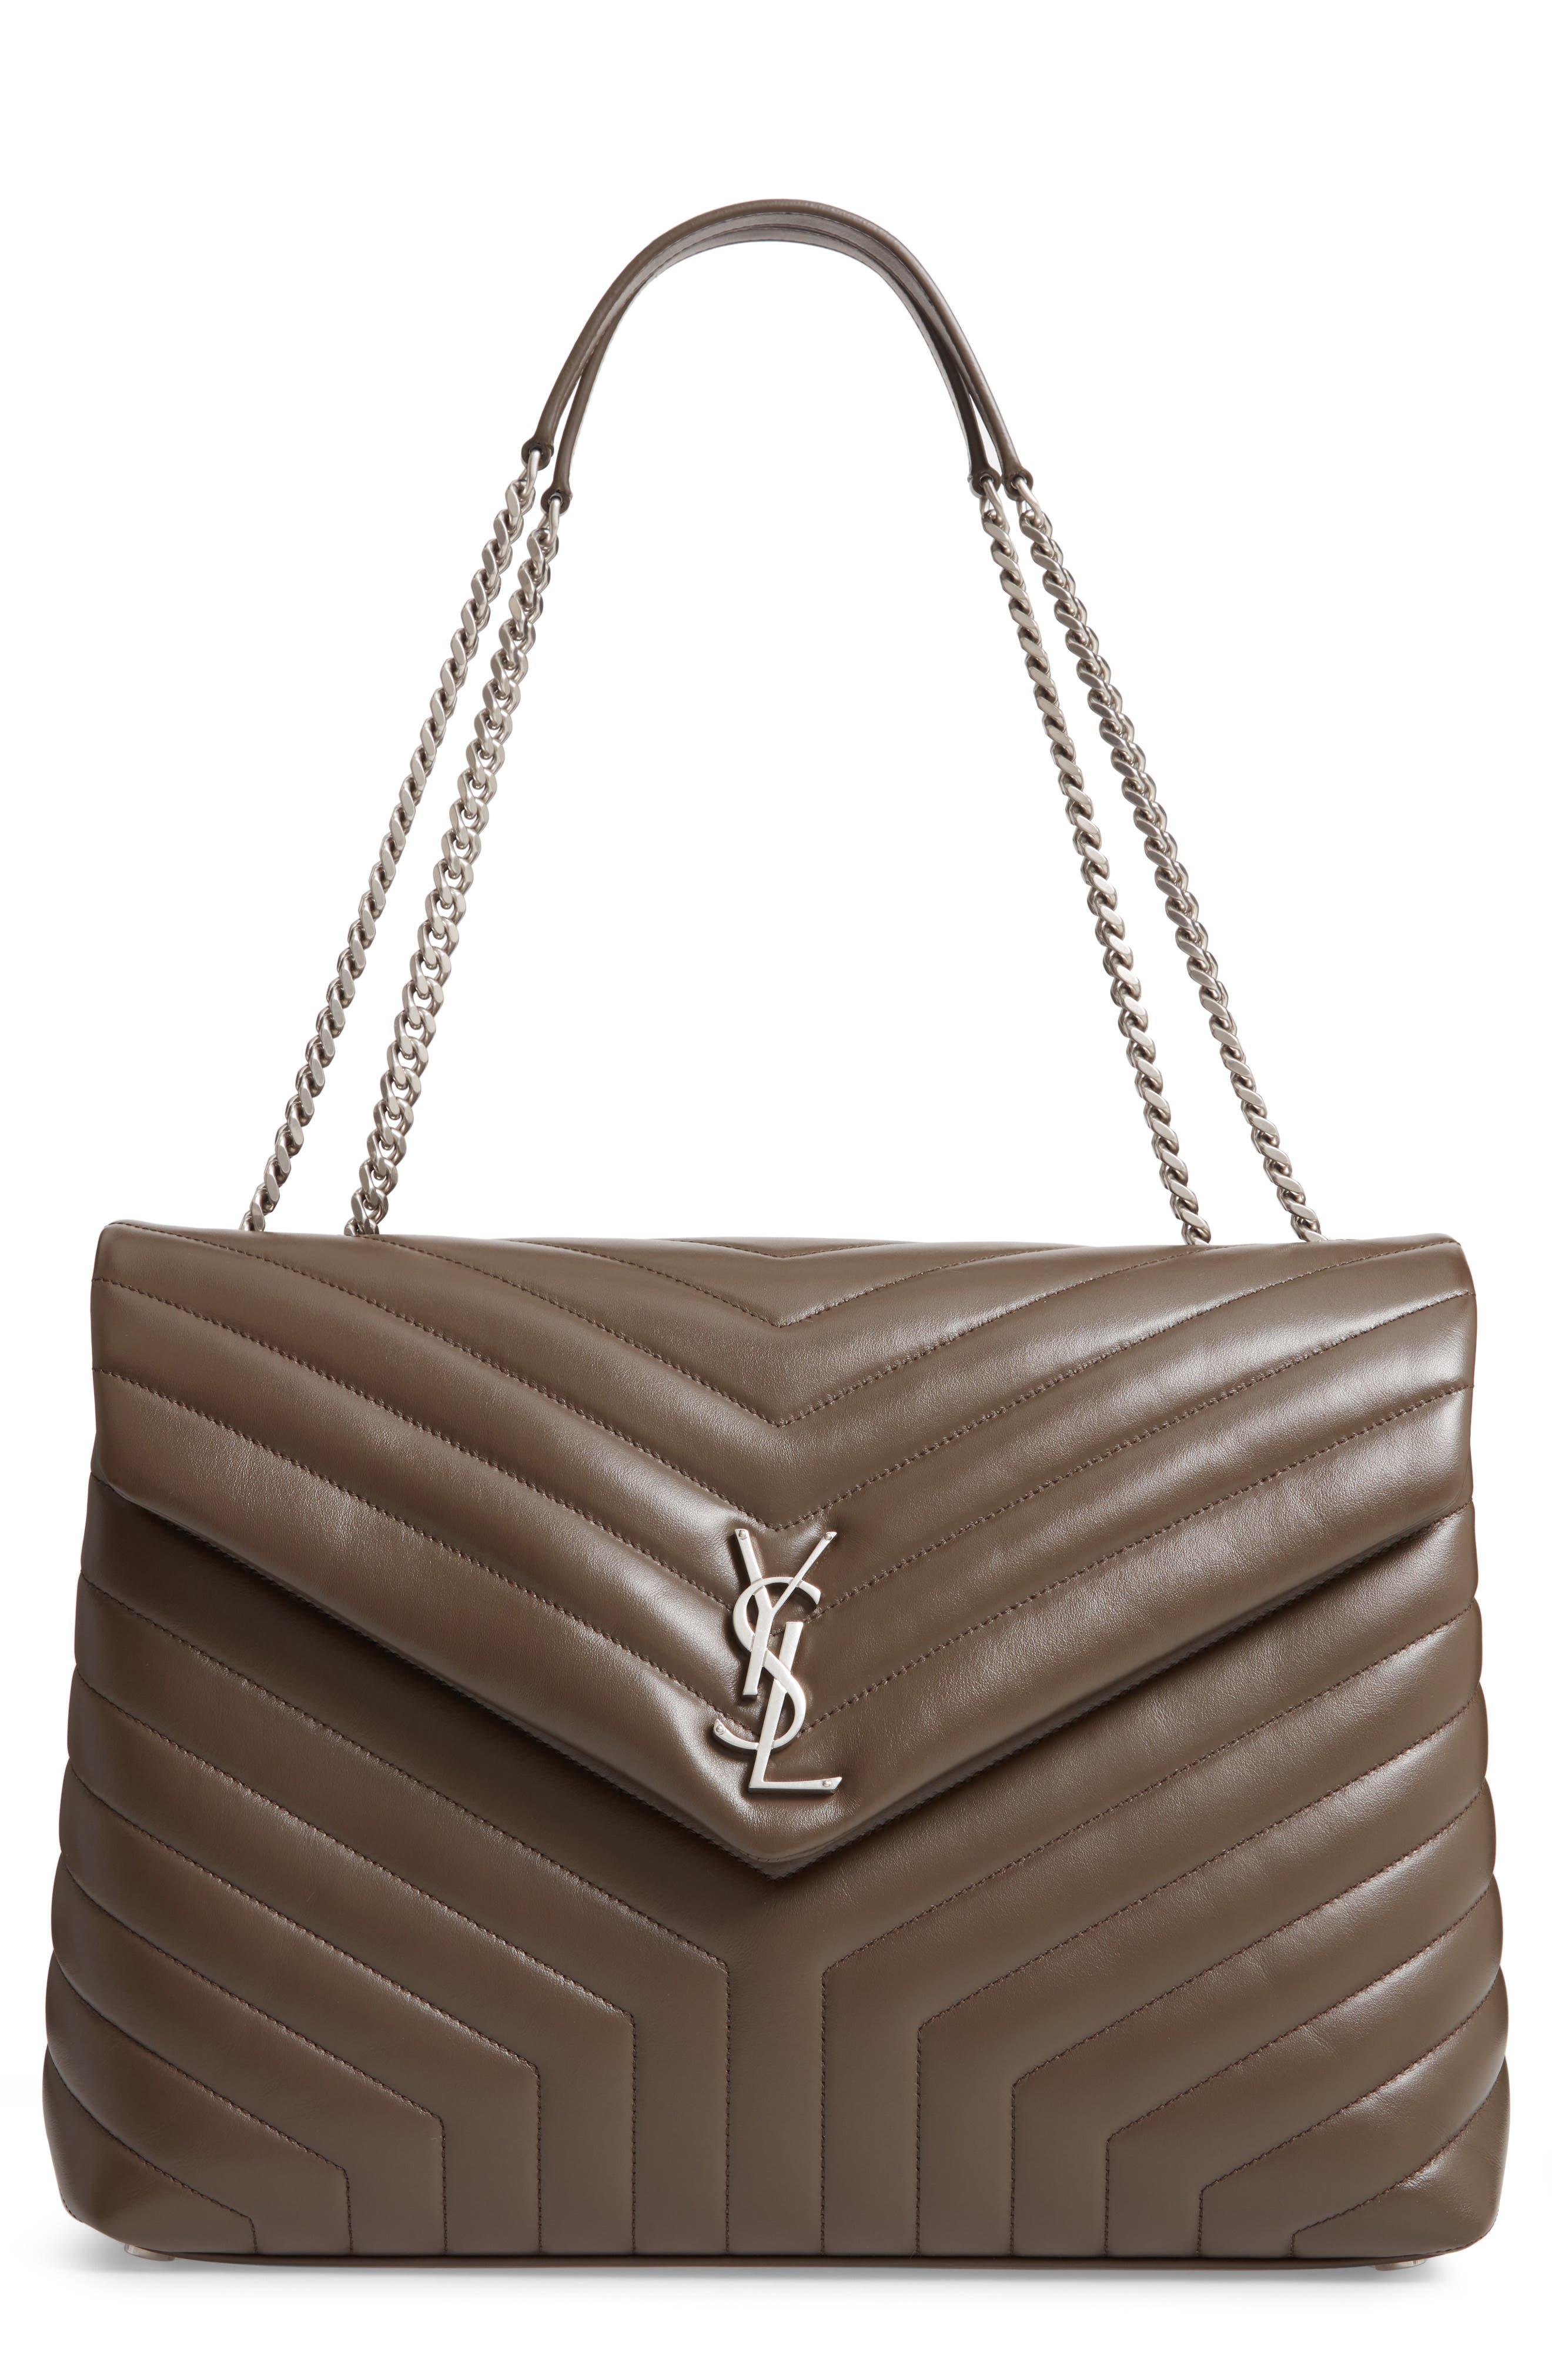 Large Loulou Matelassé Leather Shoulder Bag,                         Main,                         color, FAGGIO/ FAGGIO